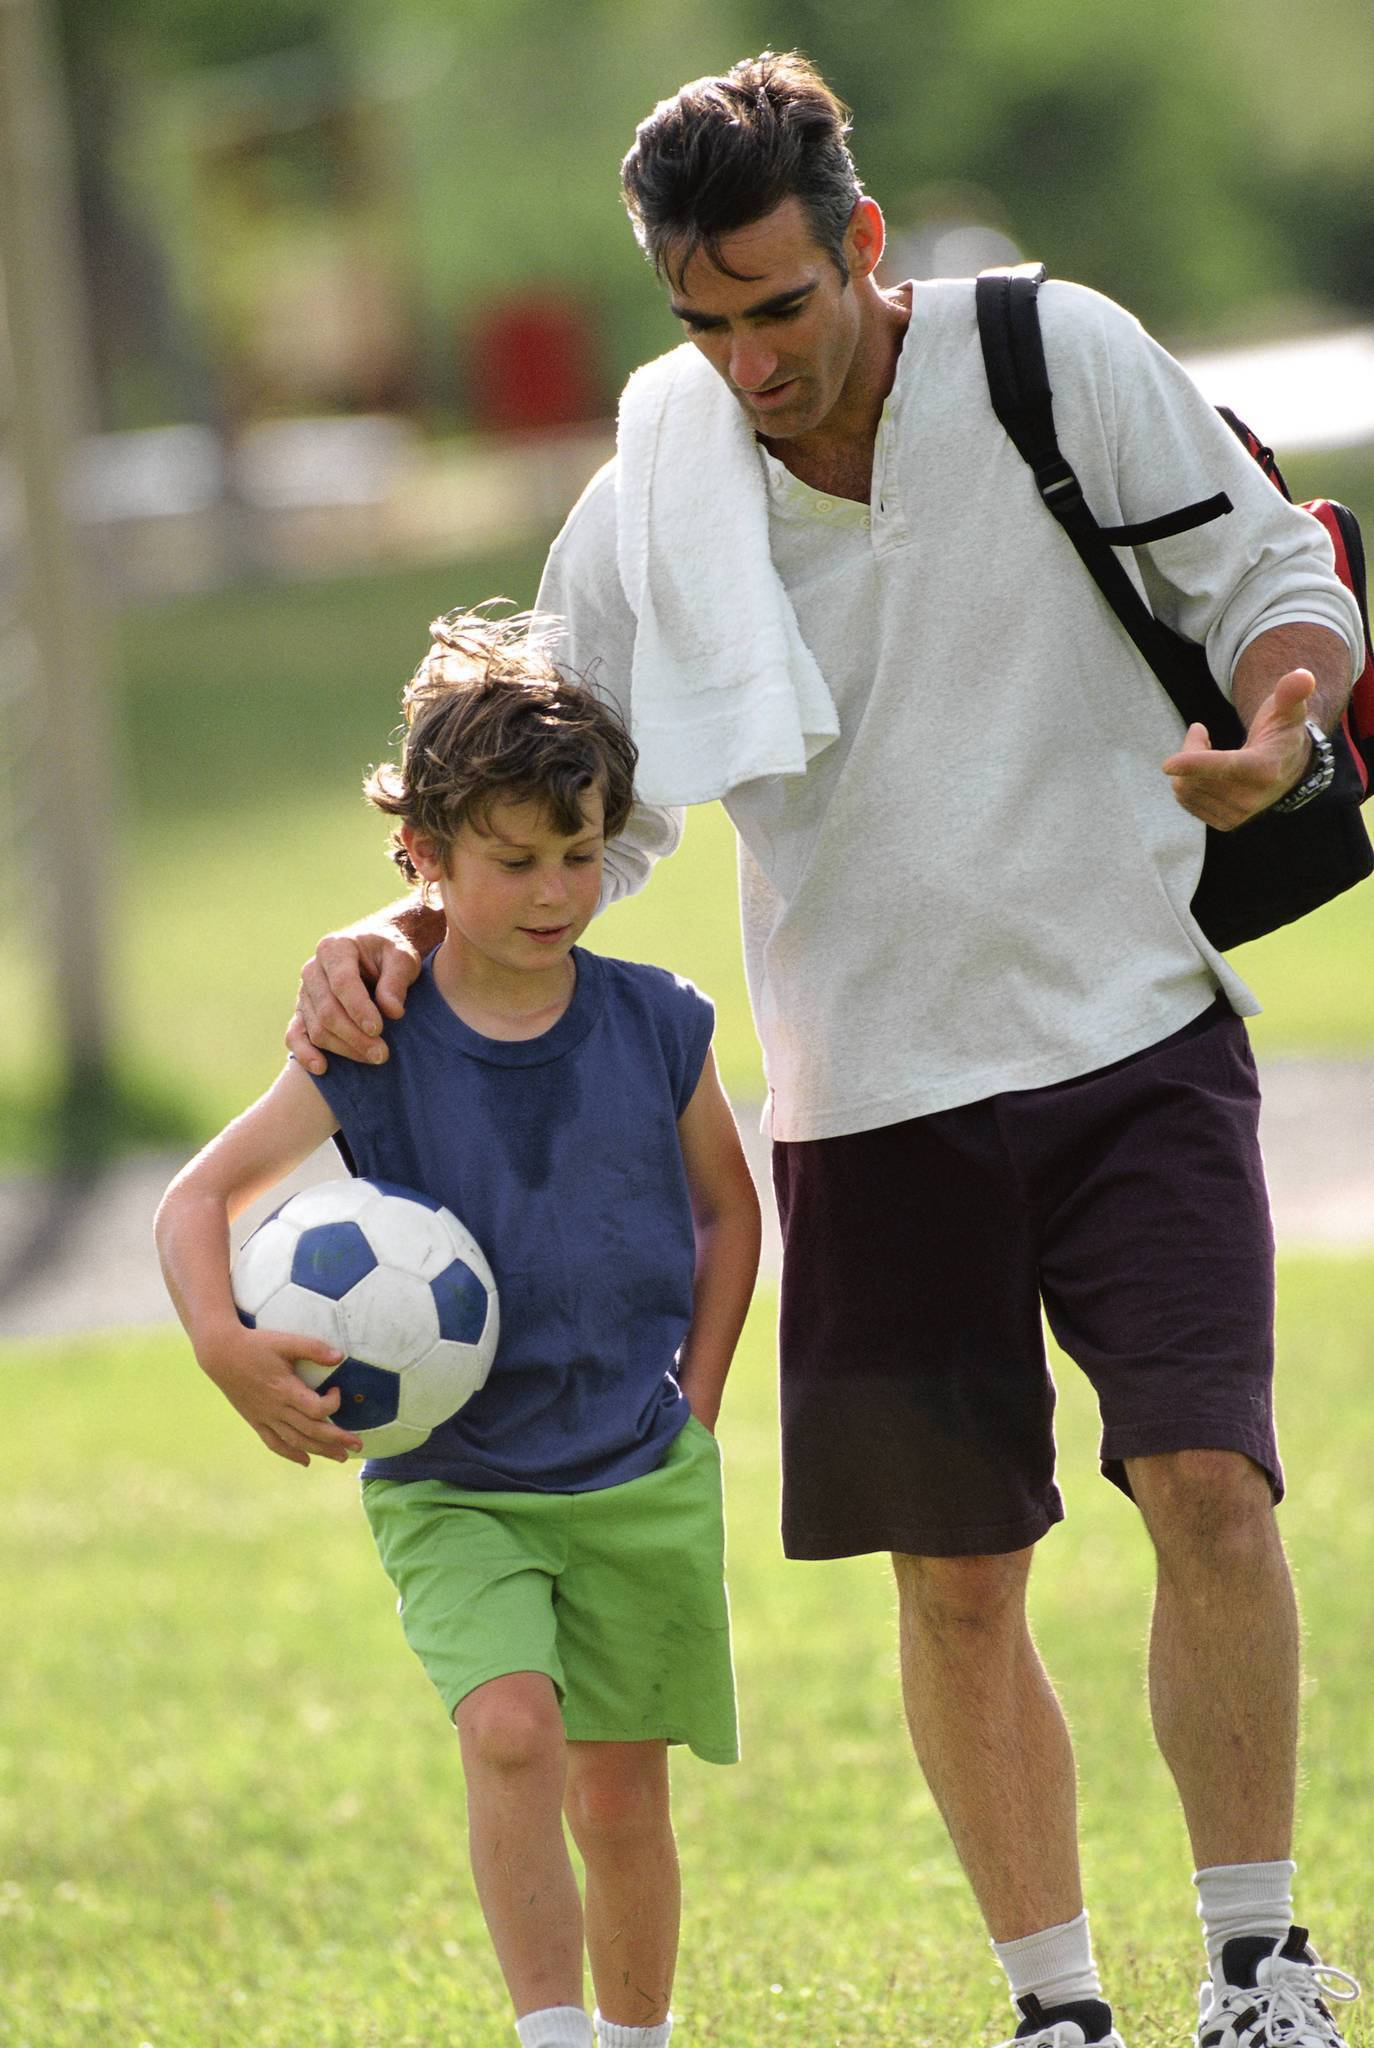 sc-fam-0416-parenthood-sports-critic-20130417.jpg